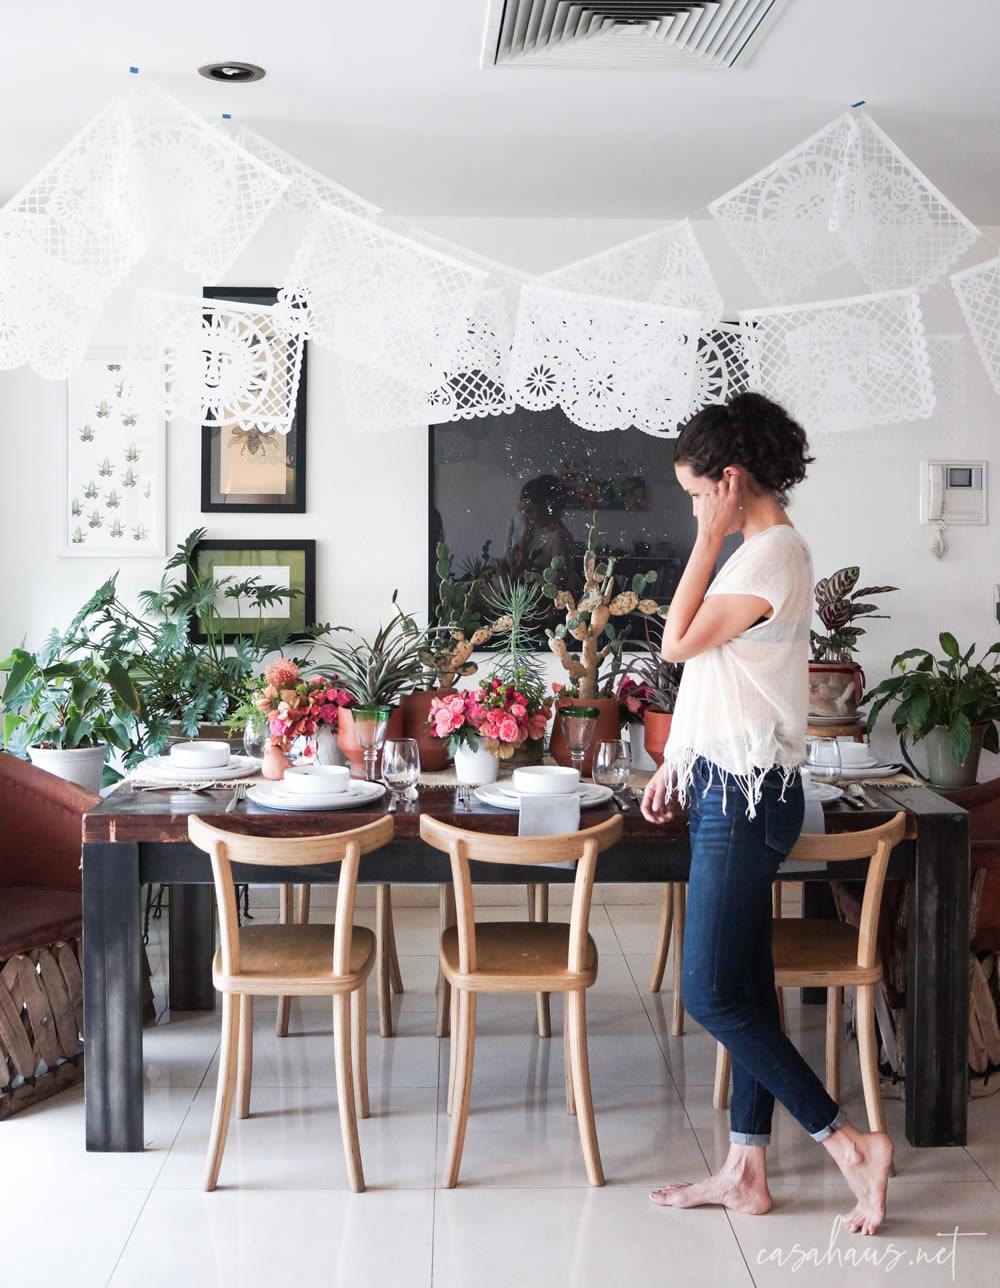 Mujer joven montando una mesa mexicana moderna